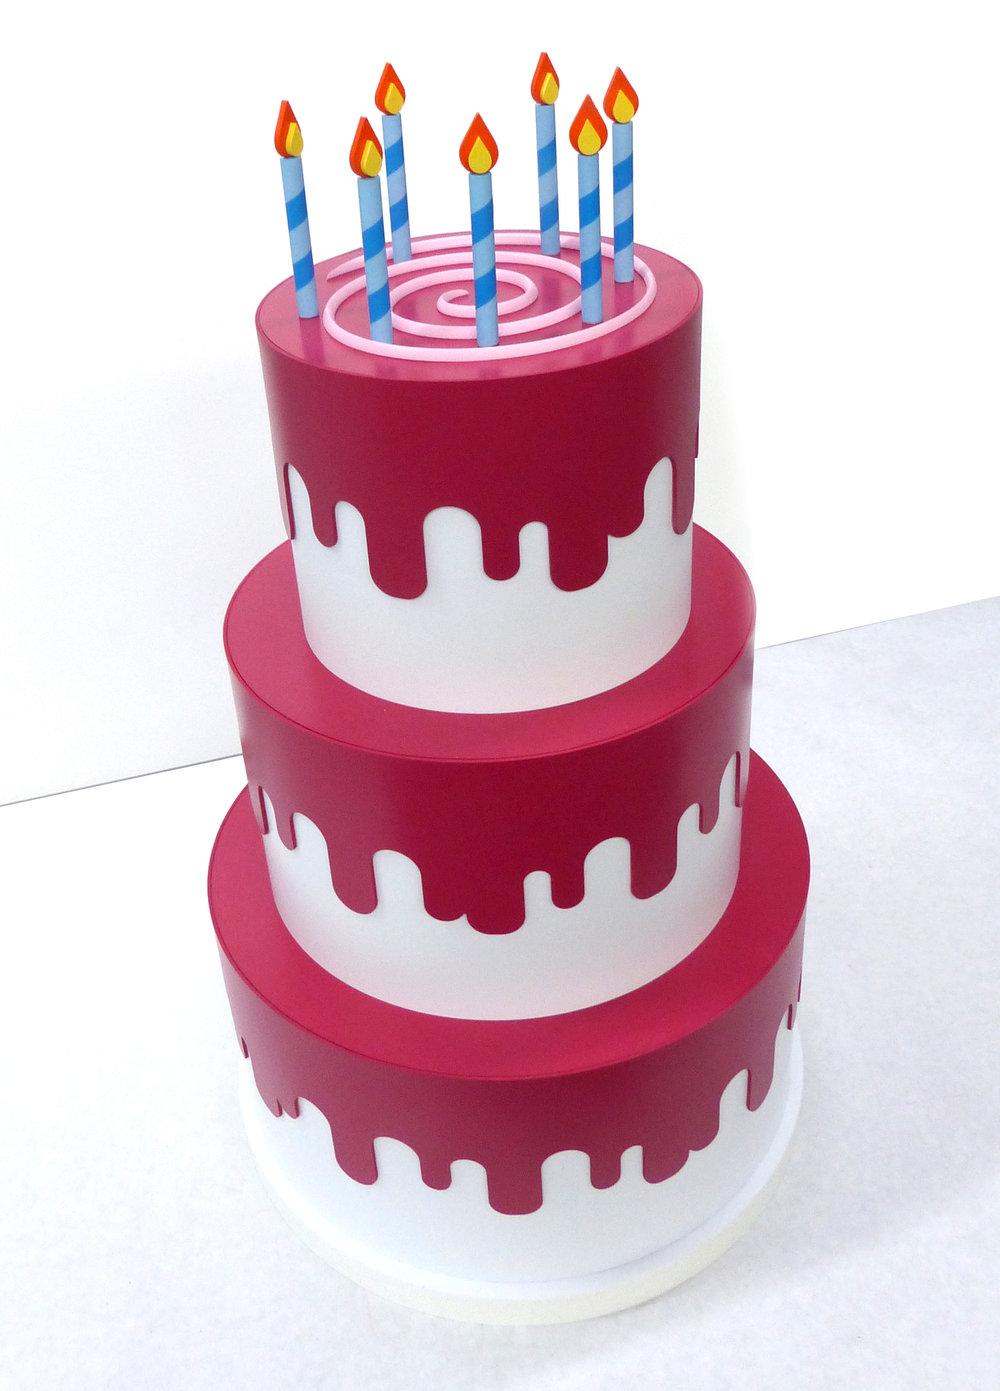 Cake 06.jpg